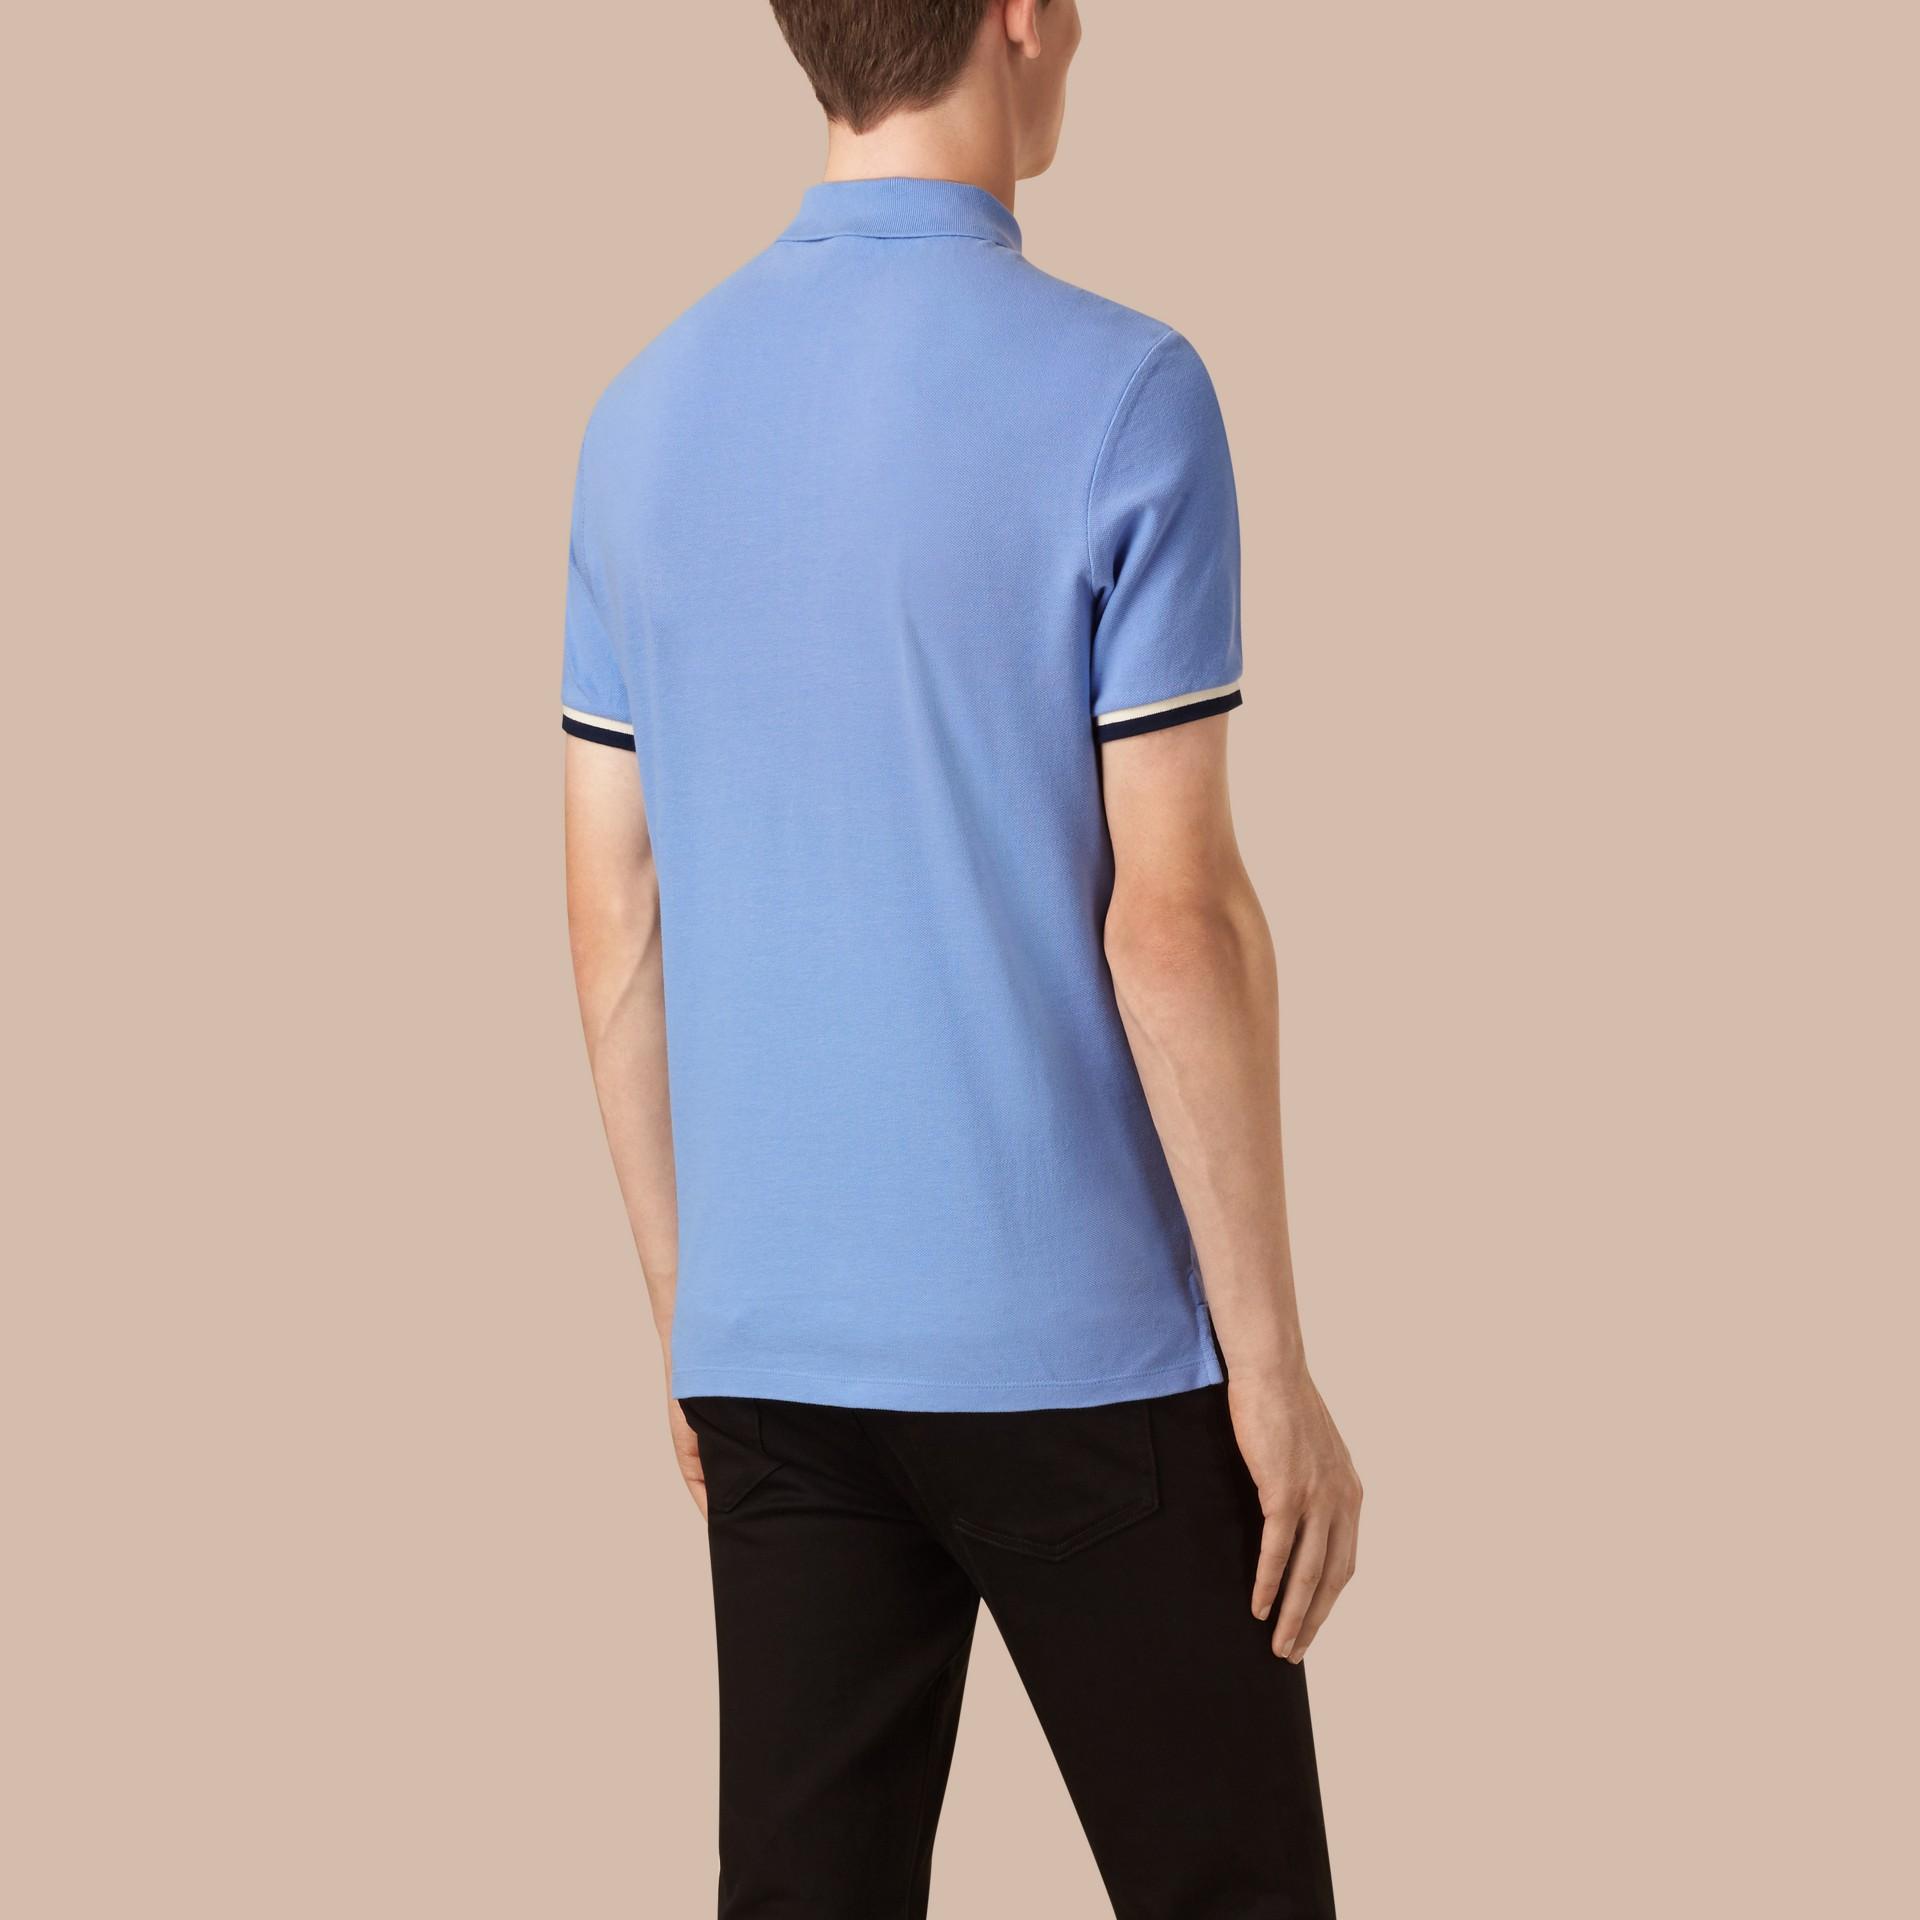 Hydrangea blue Contrast Cuff Cotton Piqué Polo Shirt Hydrangea Blue - gallery image 2